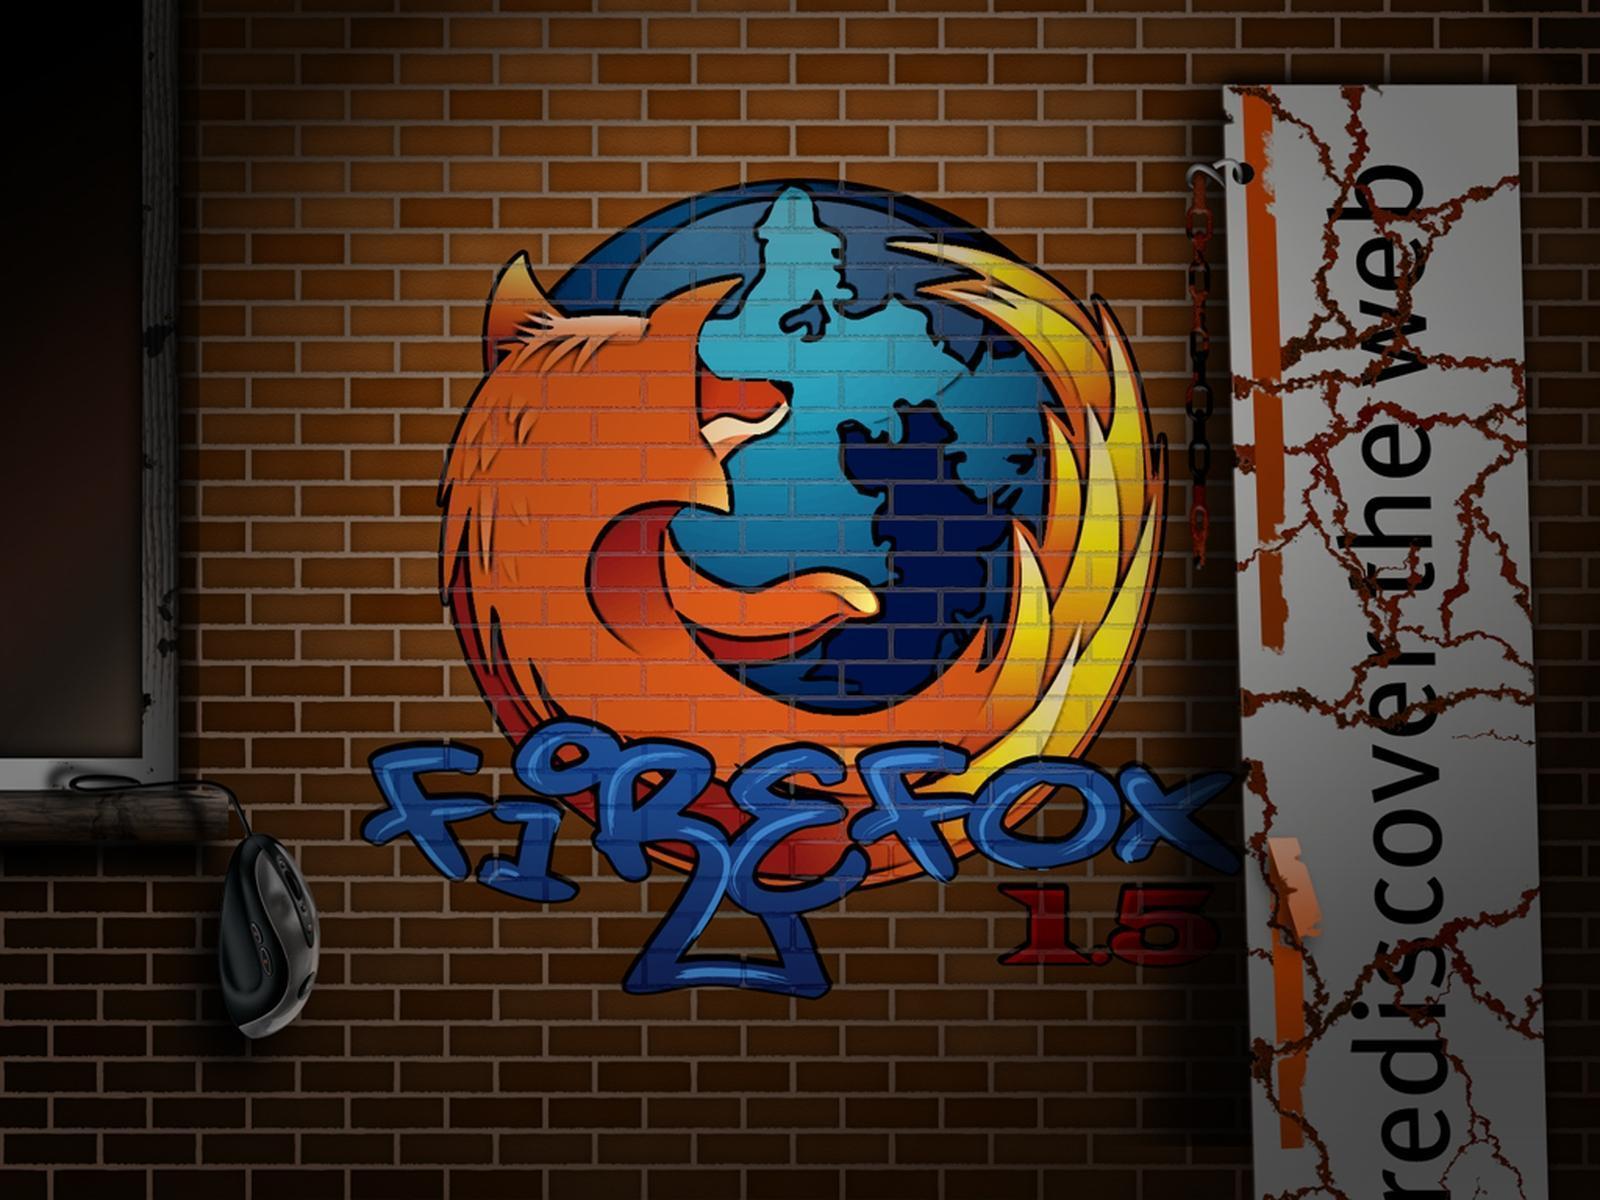 Graffiti Backgrounds For Desktop - Wallpaper Cave